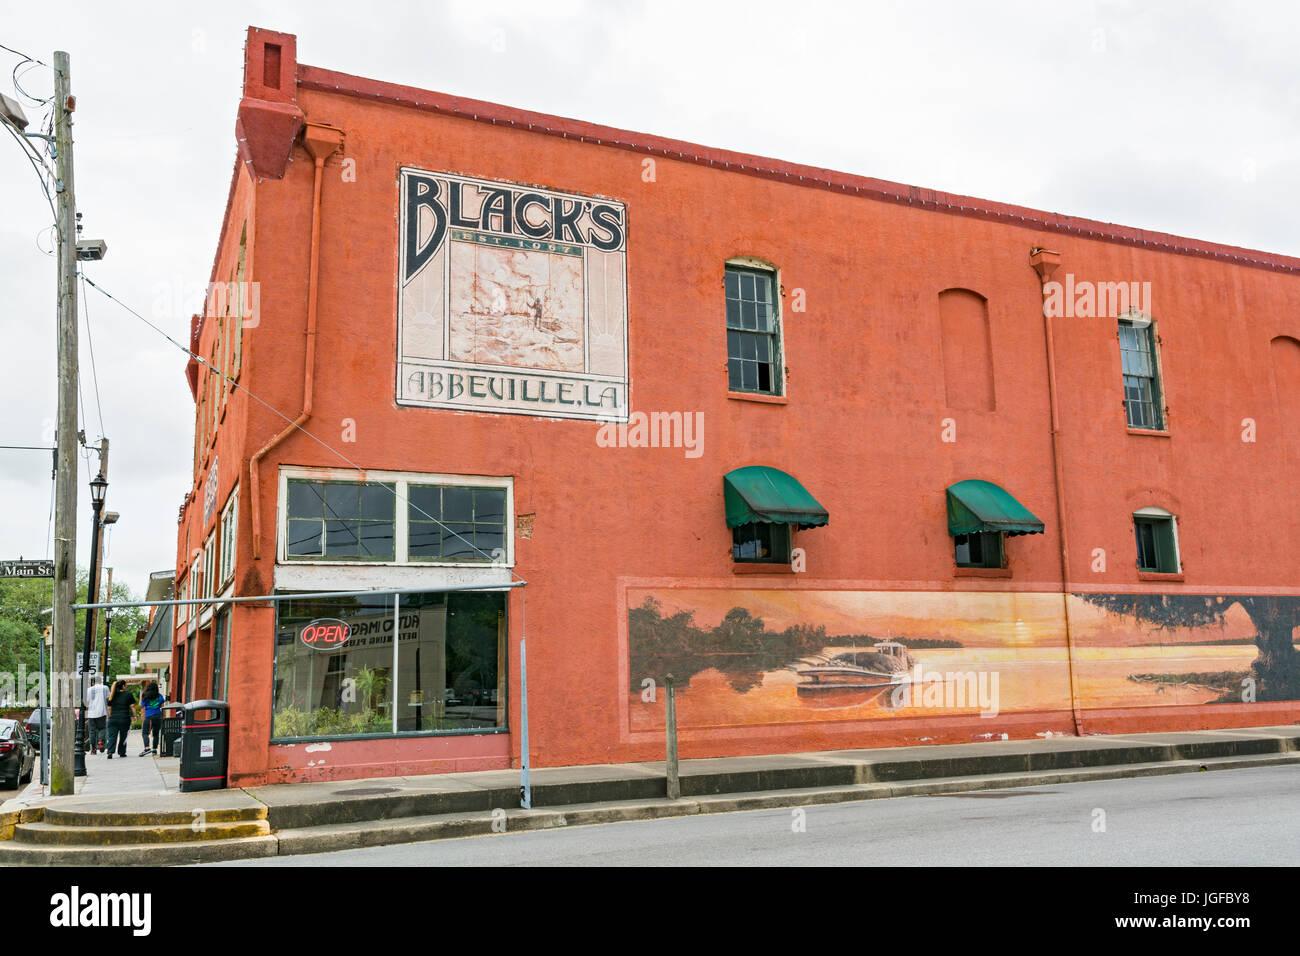 Luisiana, Abbeville, Vermilion Parish, Black's Oyster Bar & Seafood, establecido 1967 Imagen De Stock